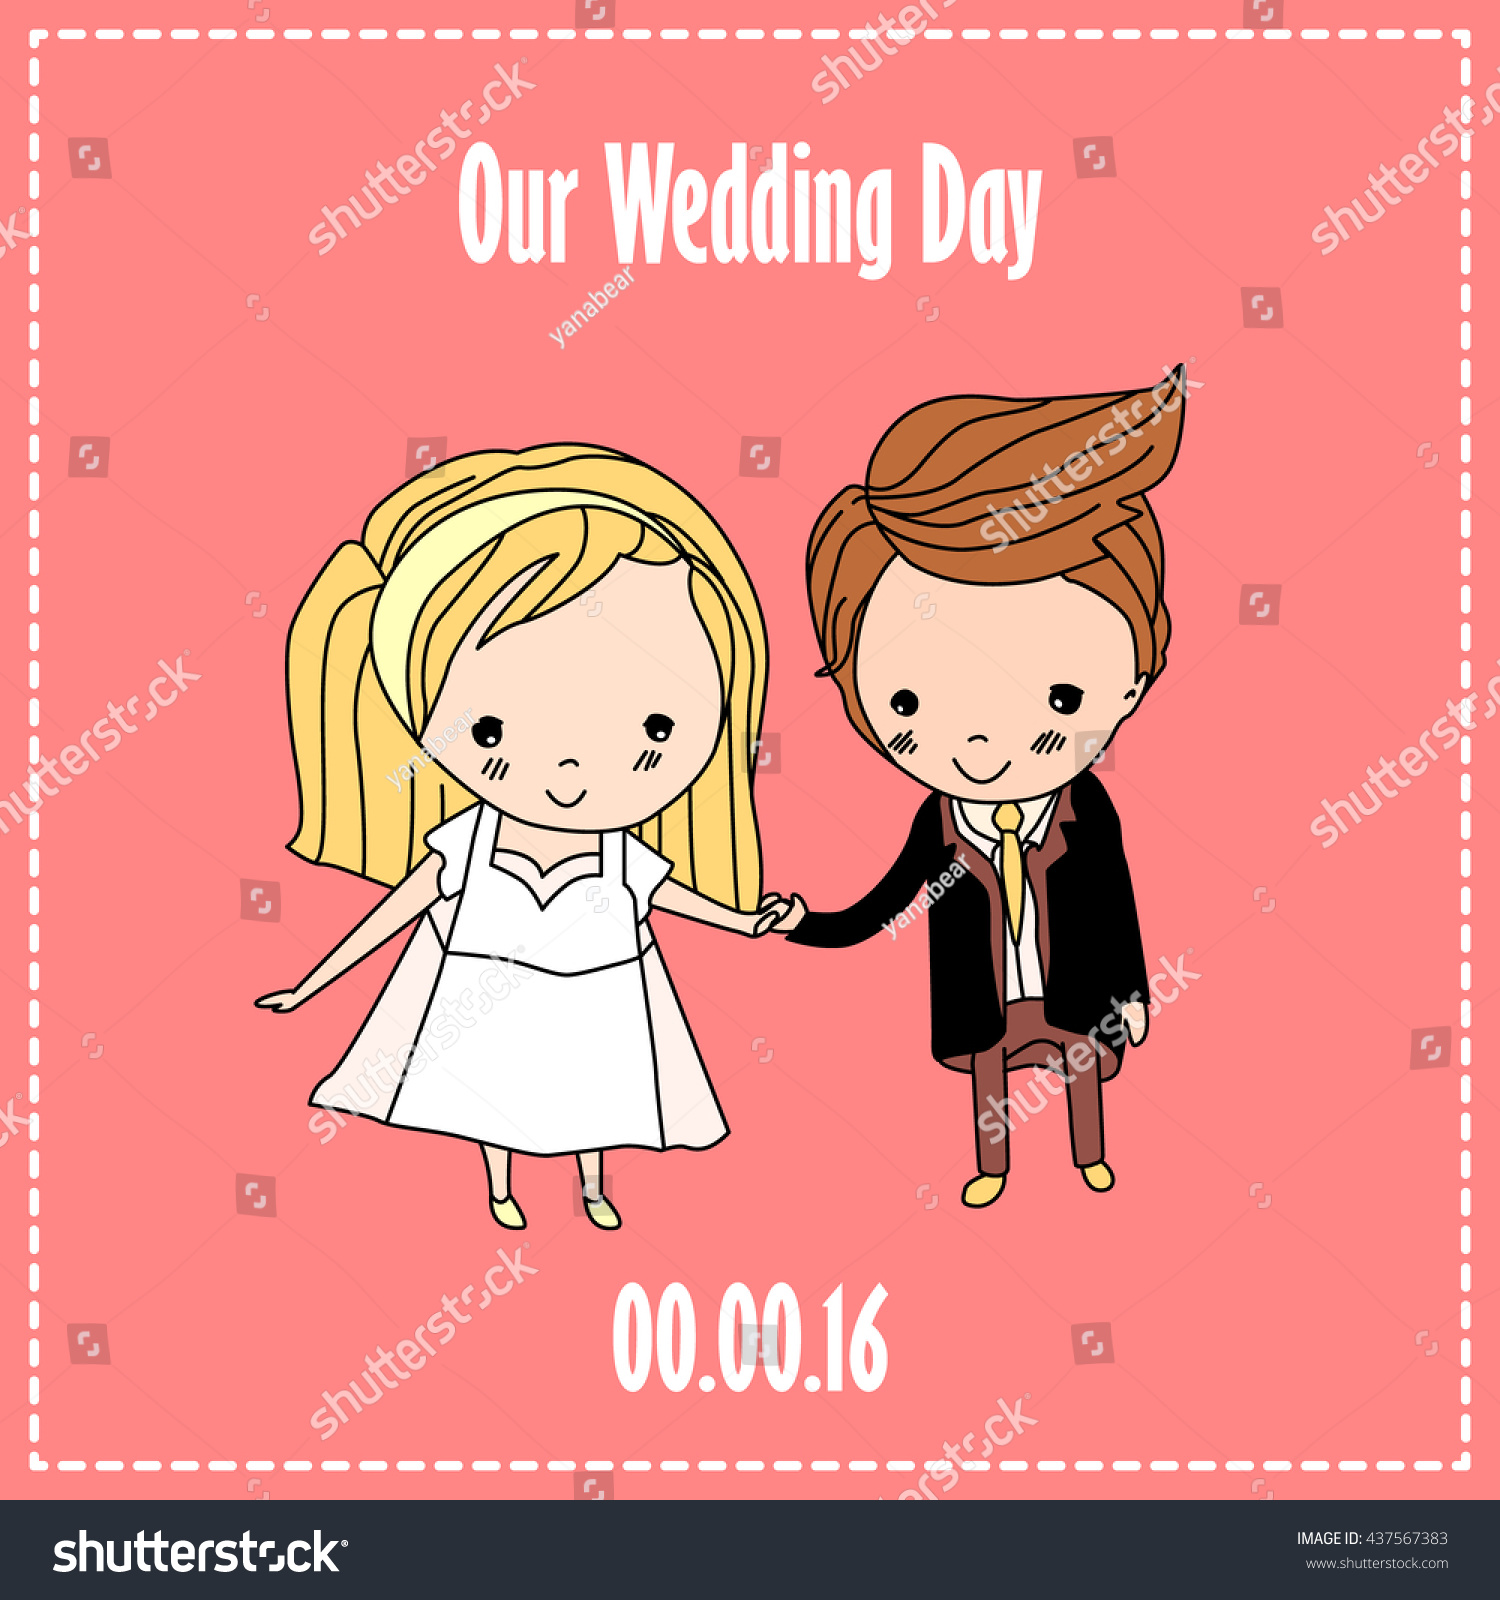 Royalty Free Wedding Invitation Card Cartoon 437567383 Stock